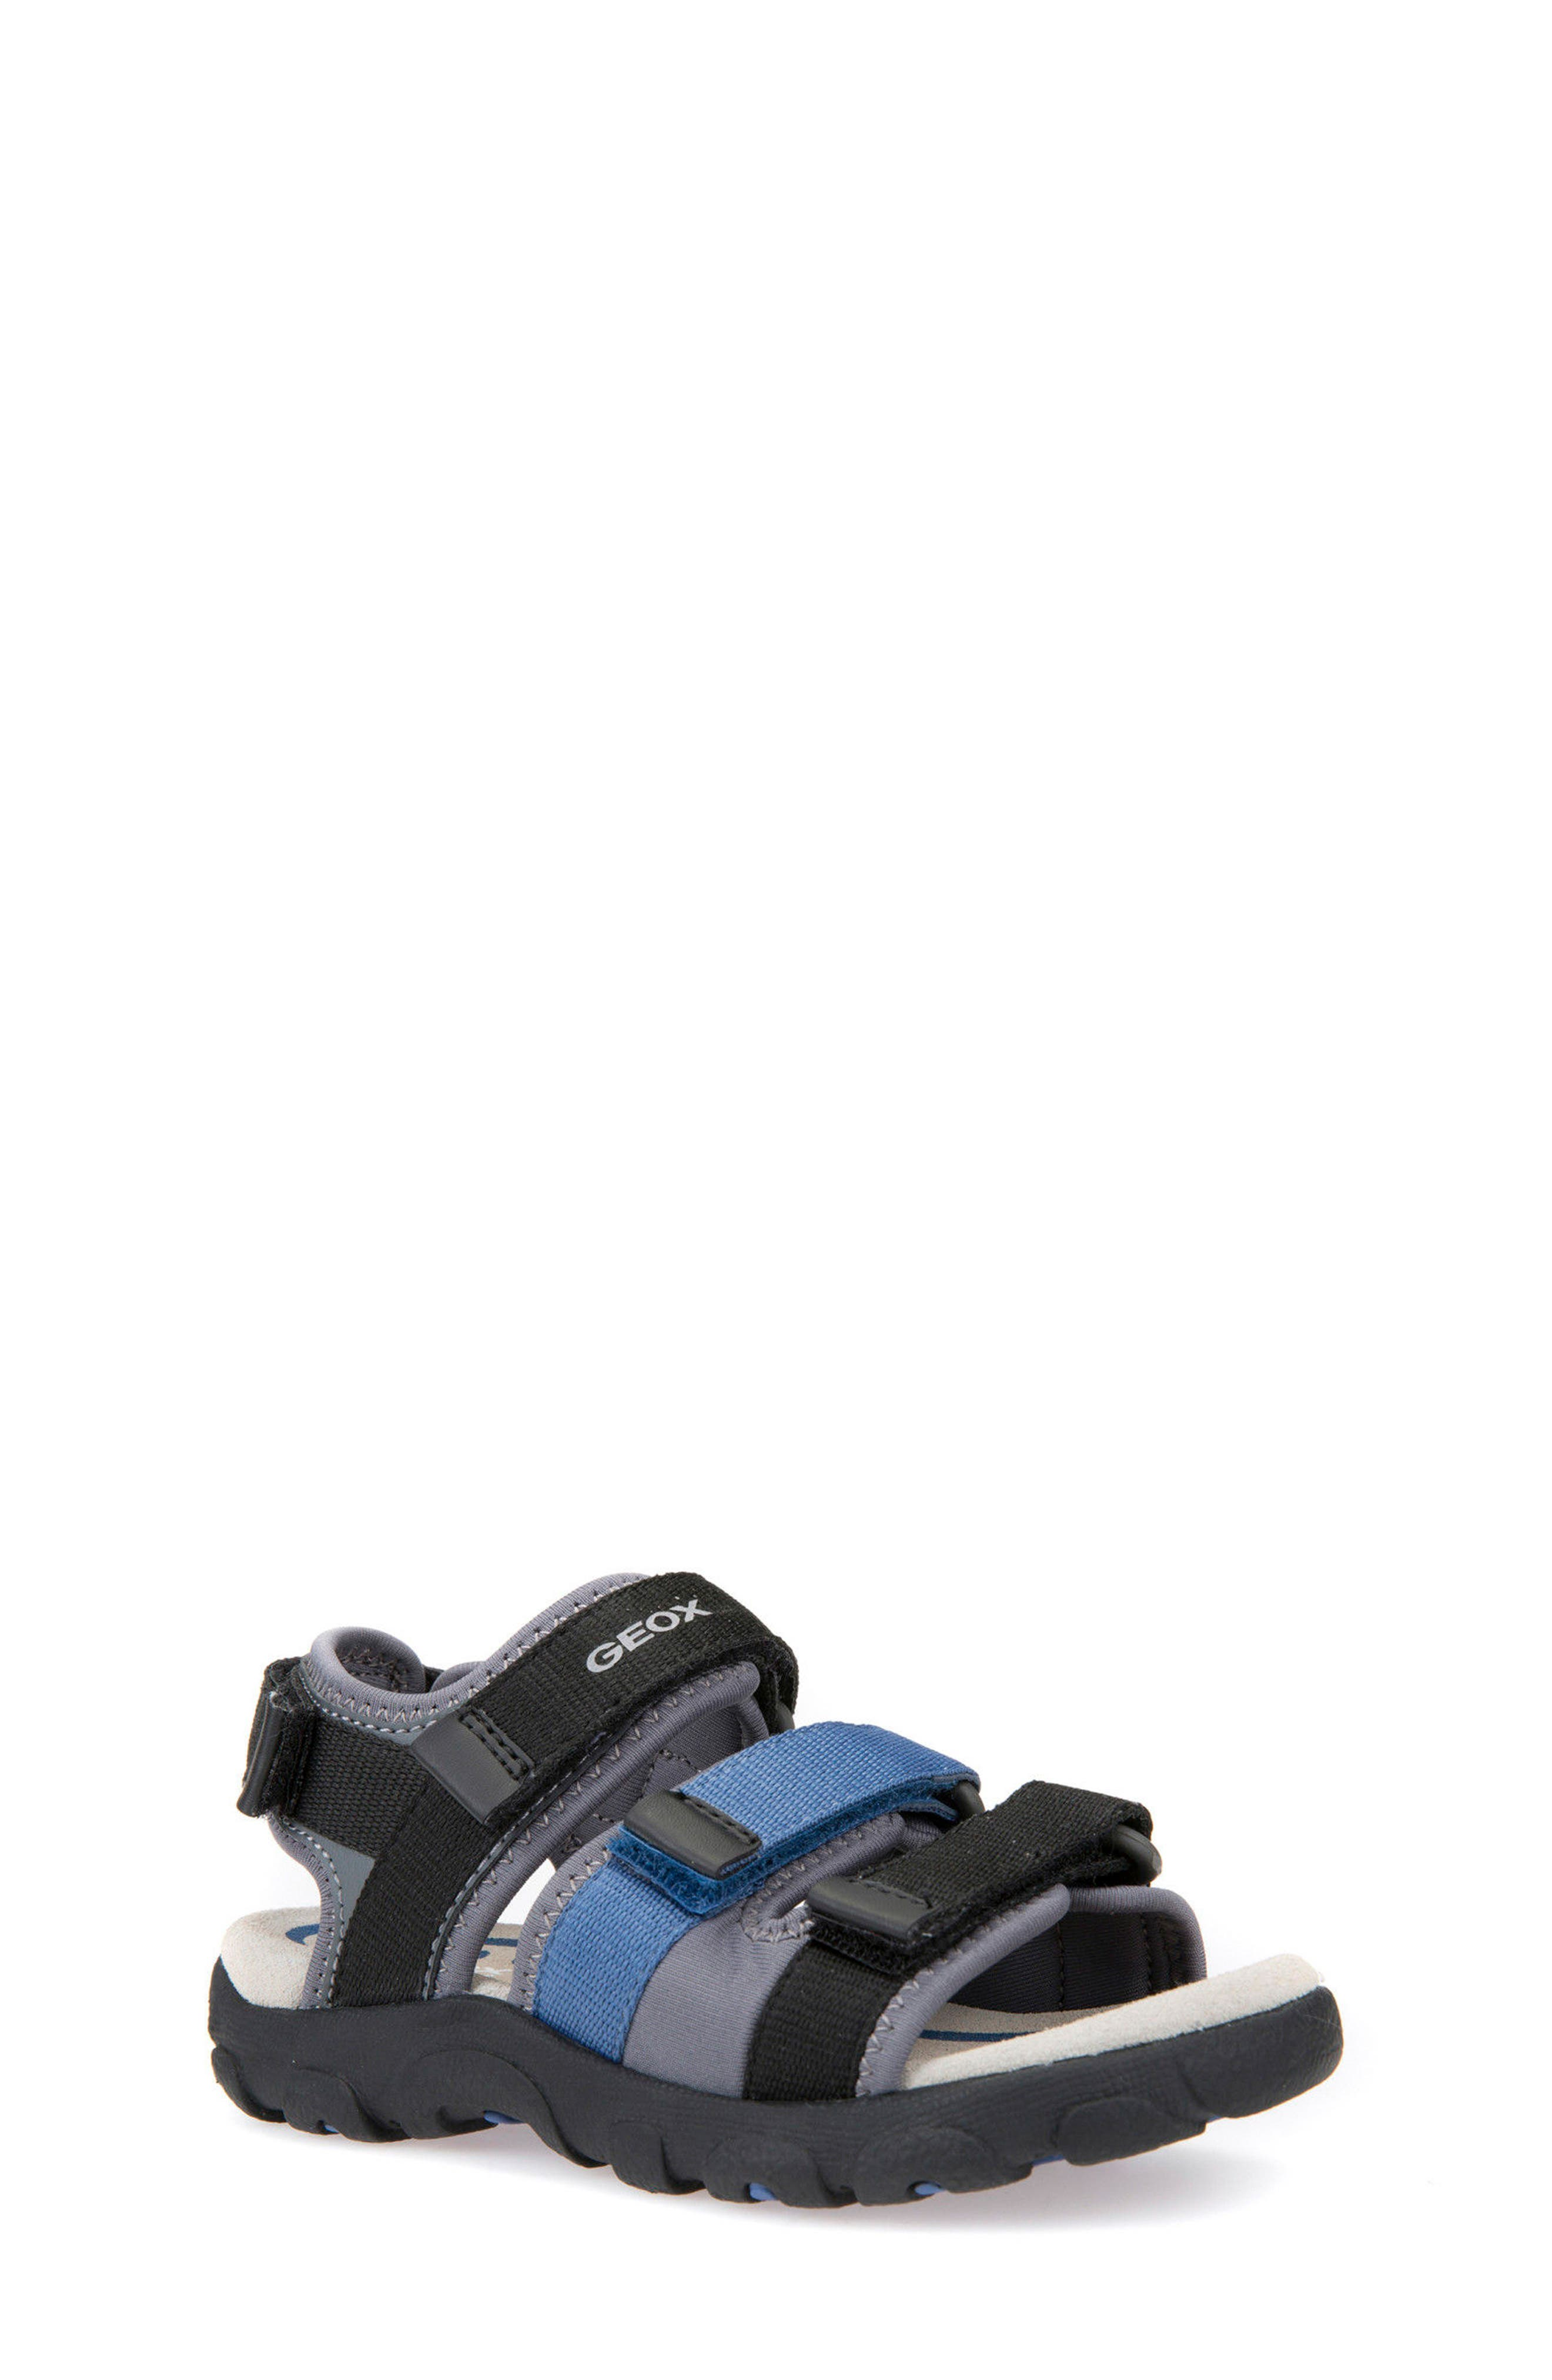 Strada Sandal,                             Main thumbnail 1, color,                             Black/ Blue